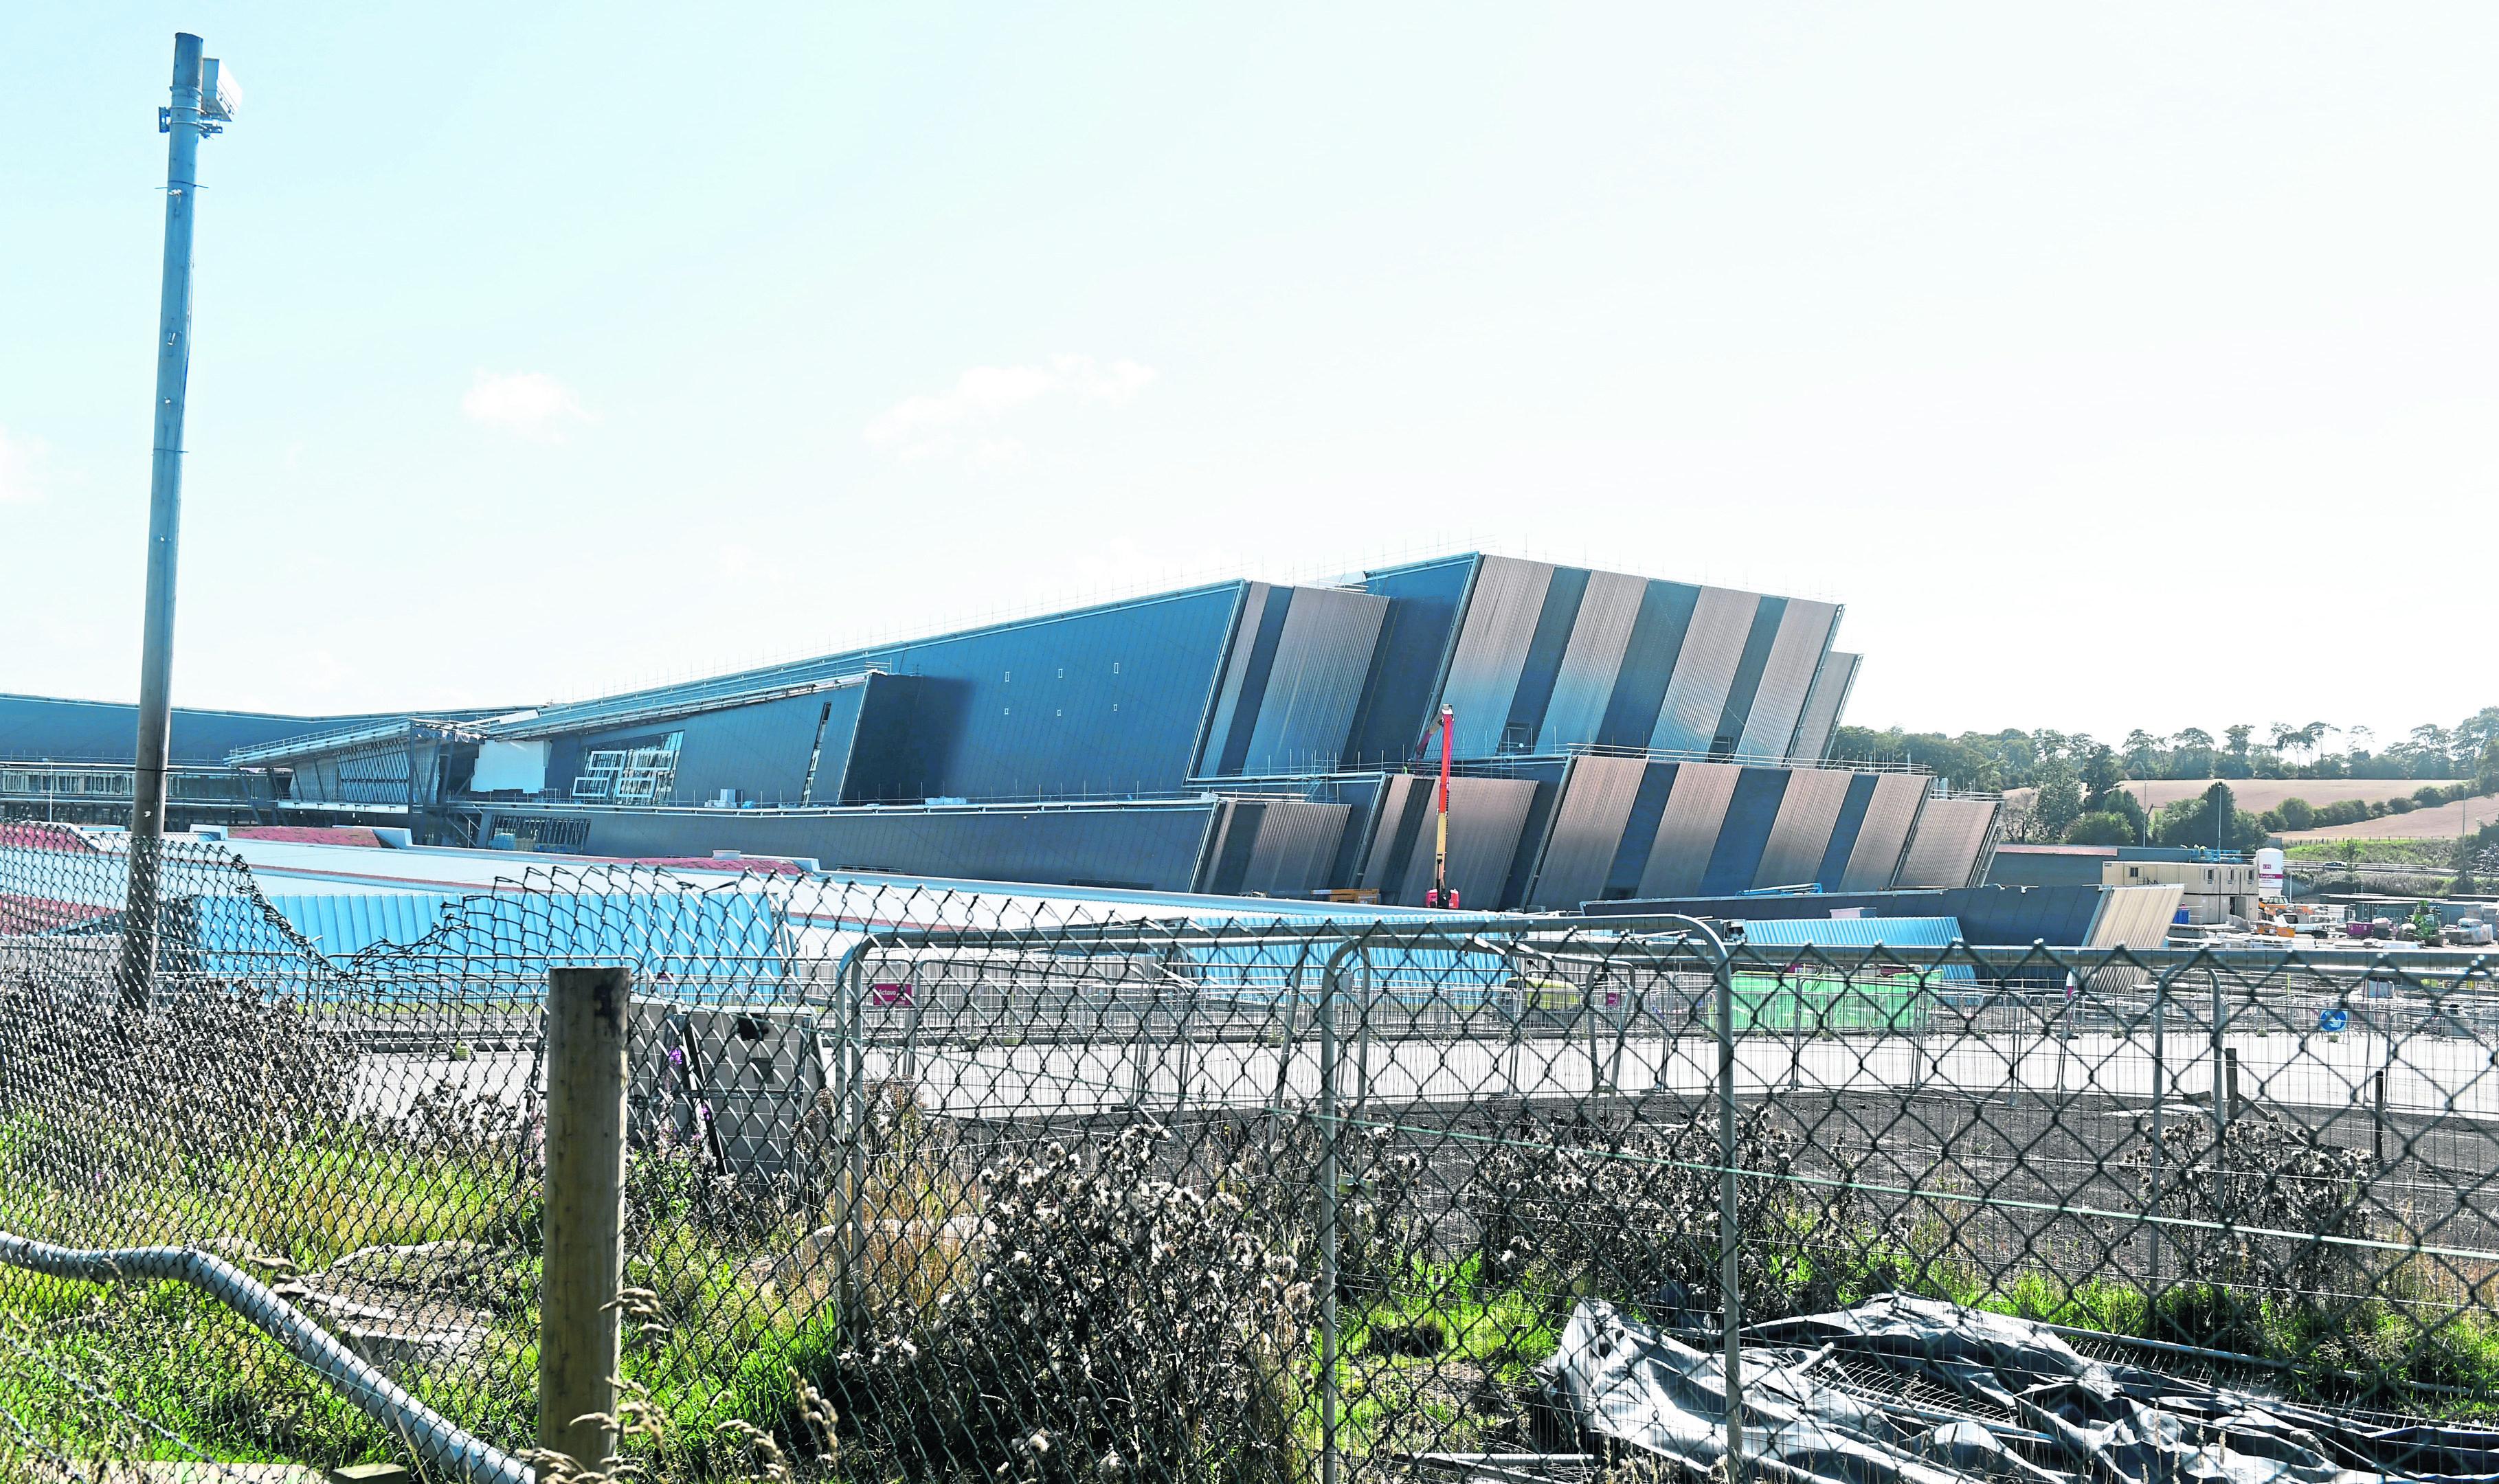 Locator of the AECC at Bucksburn. Pic by Chris Sumner Taken 31/8/18